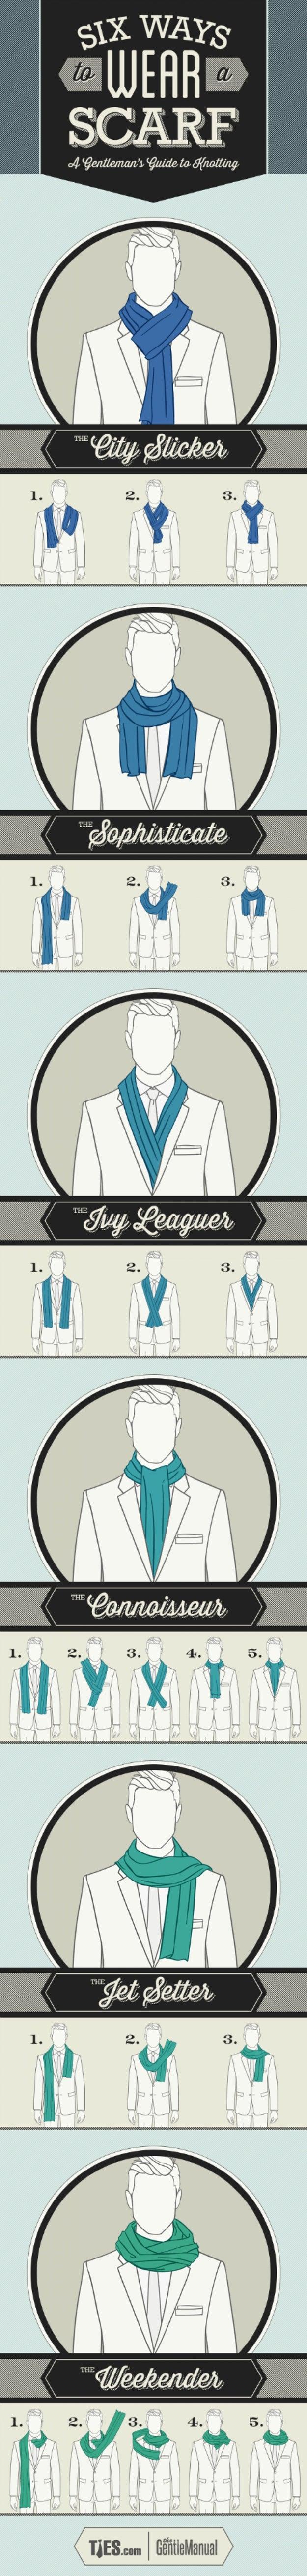 Six super ways to wear a scarf.